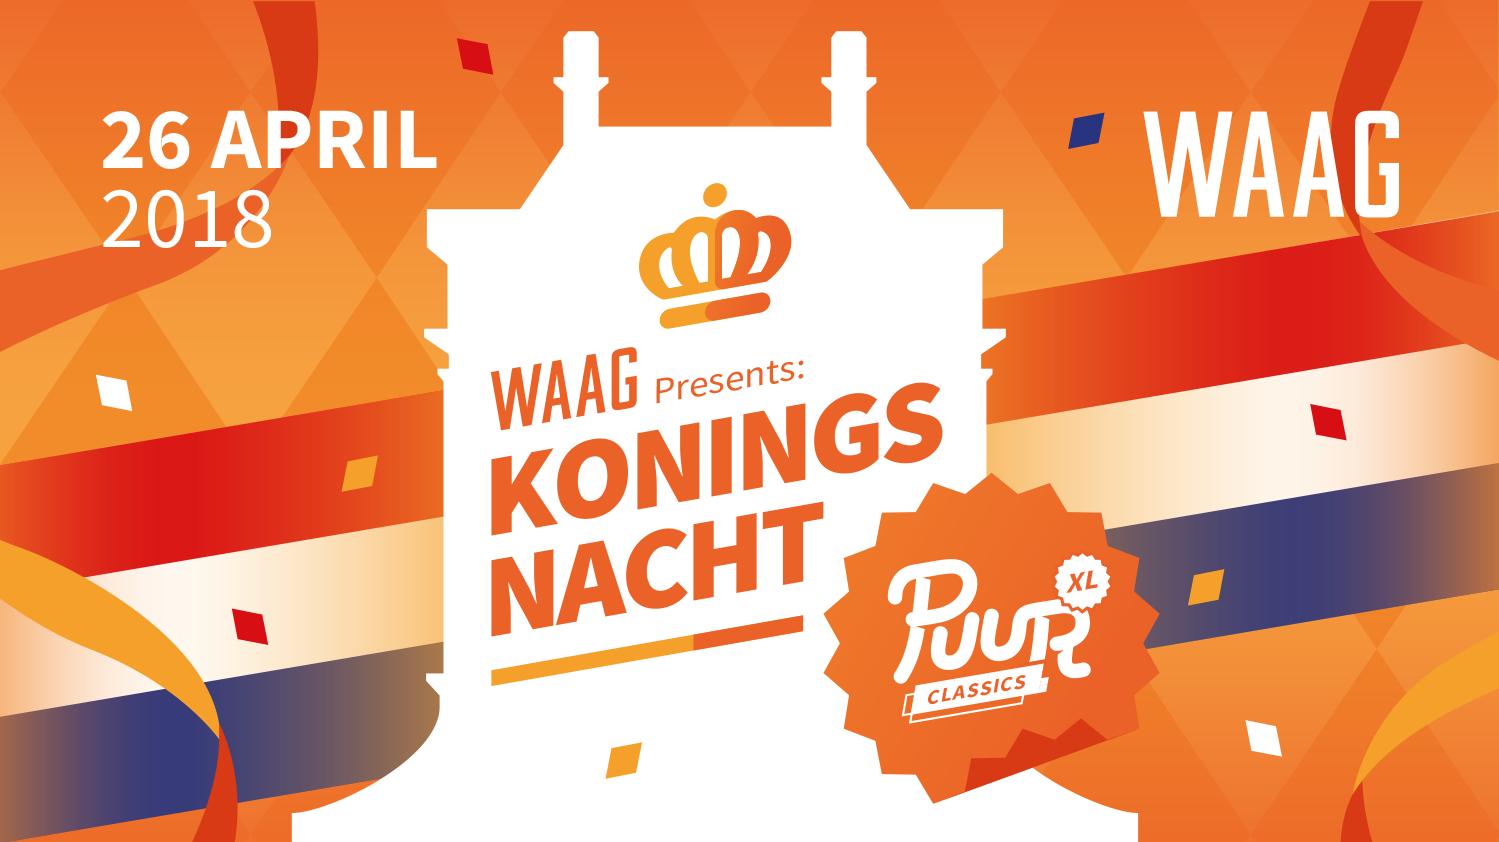 Naam Waag Presents Koningsnacht Puur Classics Xl Tijd   April Line Up Def Rhymez Barry Badpak Puur Classics Dj Team